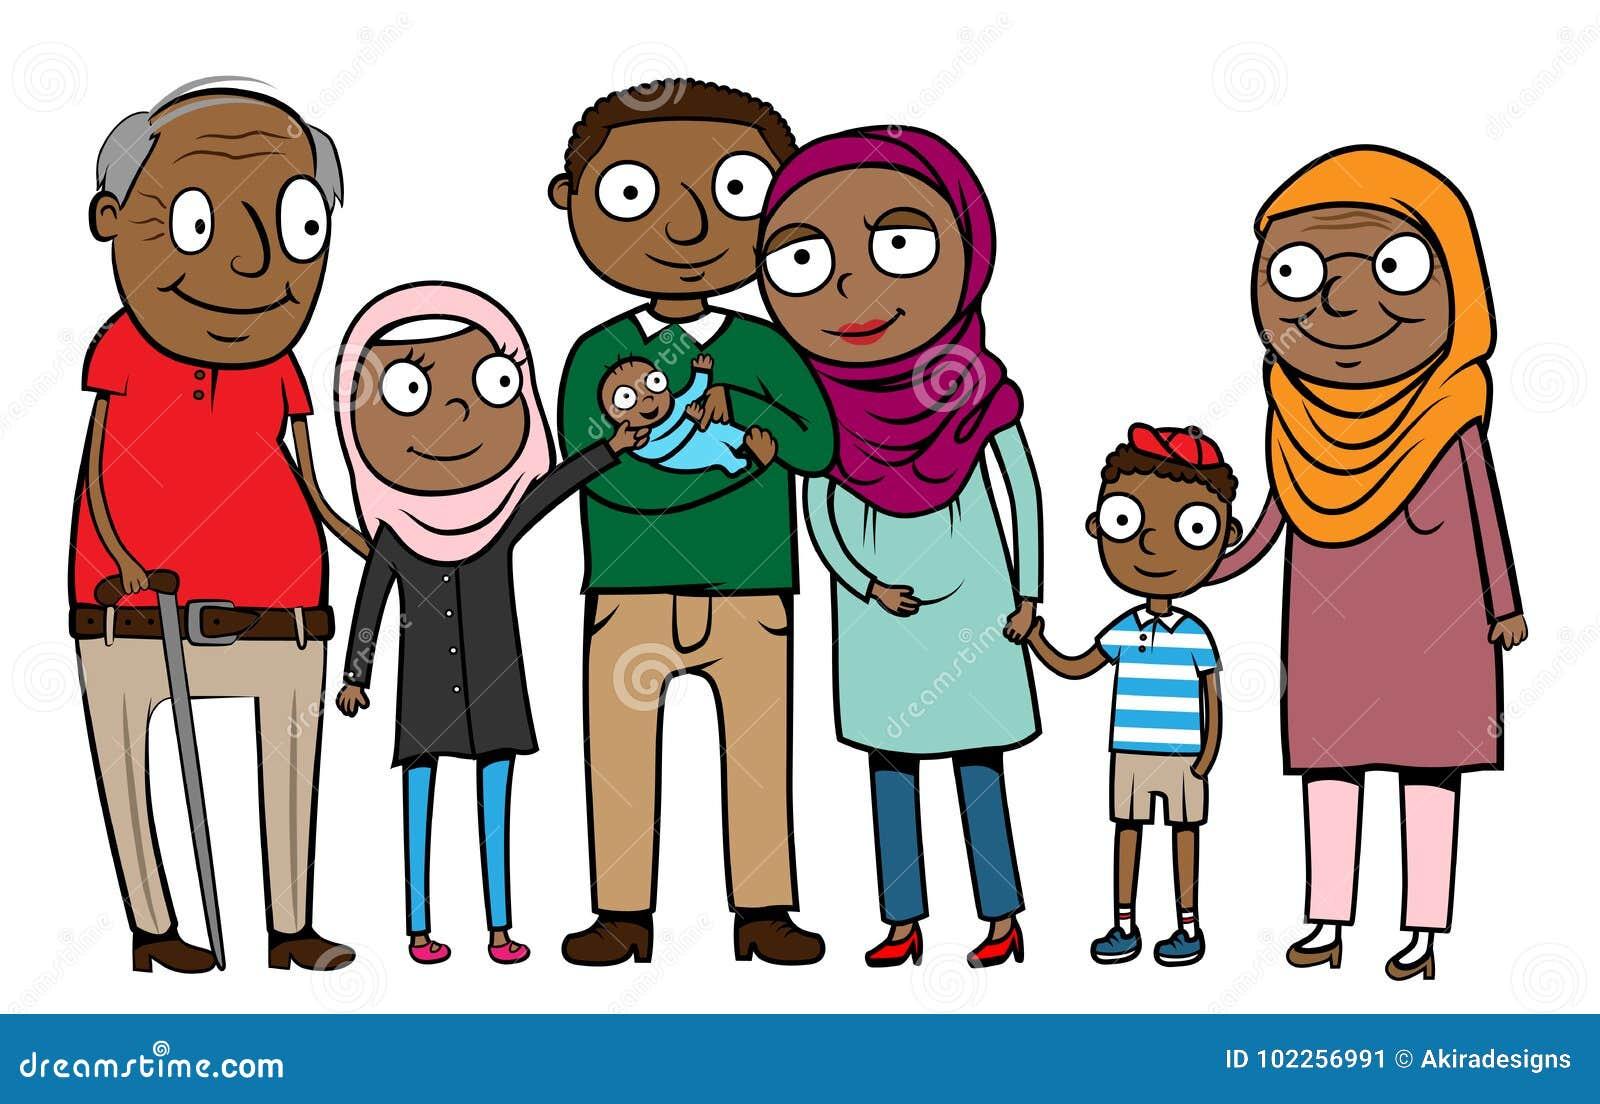 Familia Imigrante Muculmana Dos Desenhos Animados Ilustracao Do